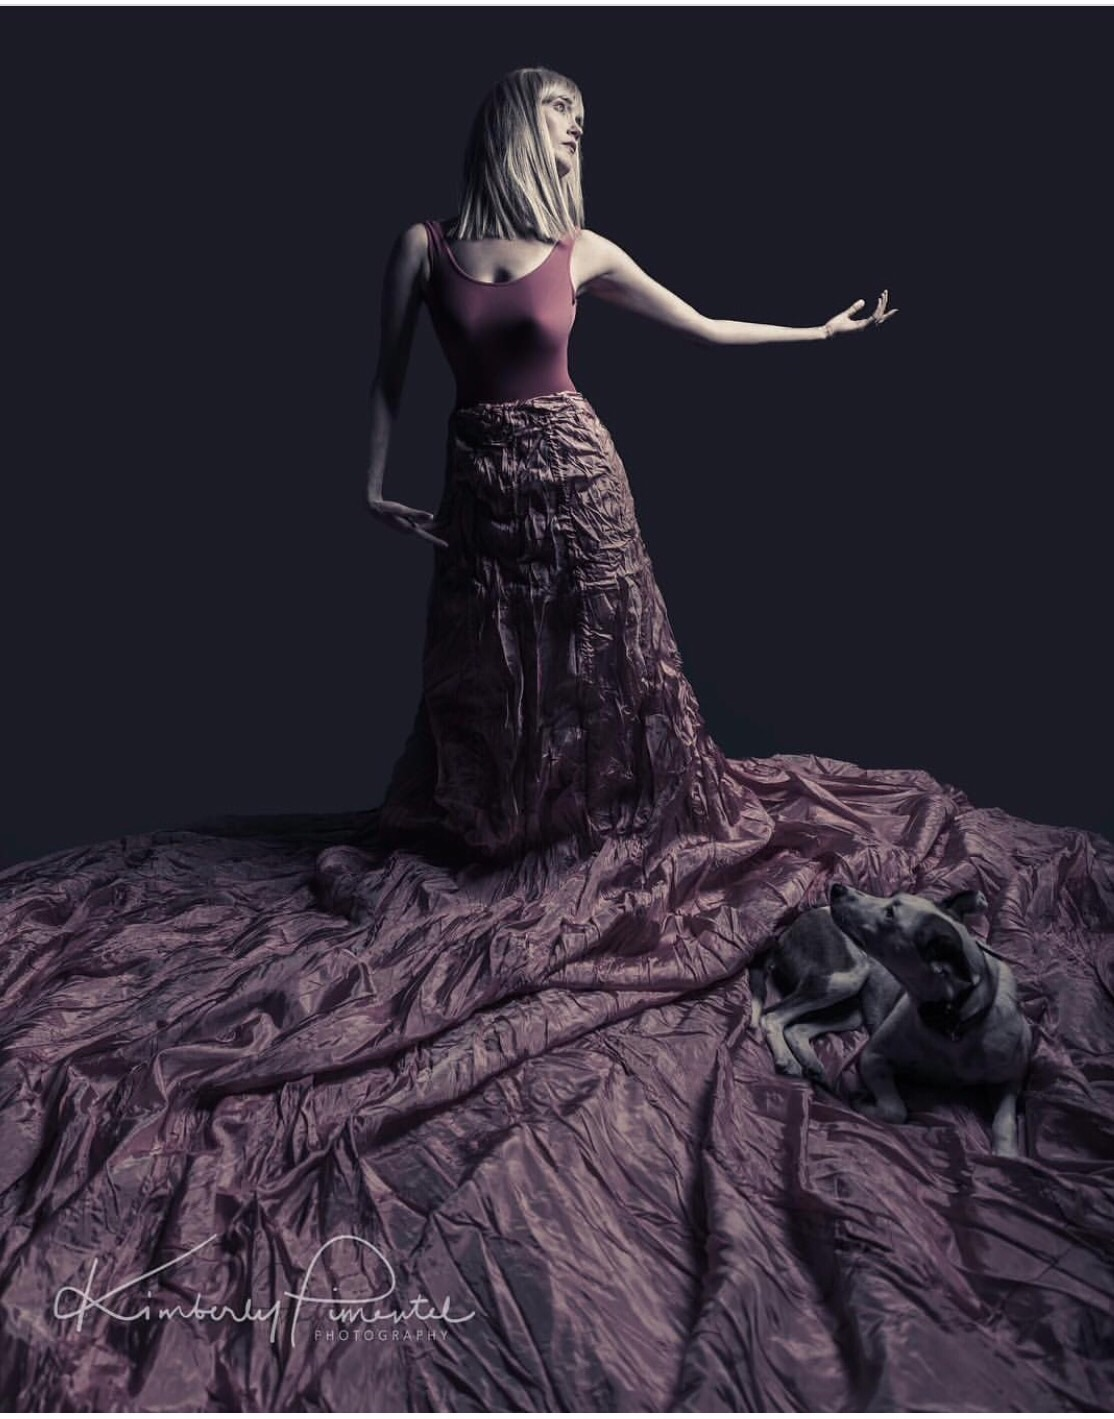 Photographer Kimberly Pimentel, Model Roxi Henrici